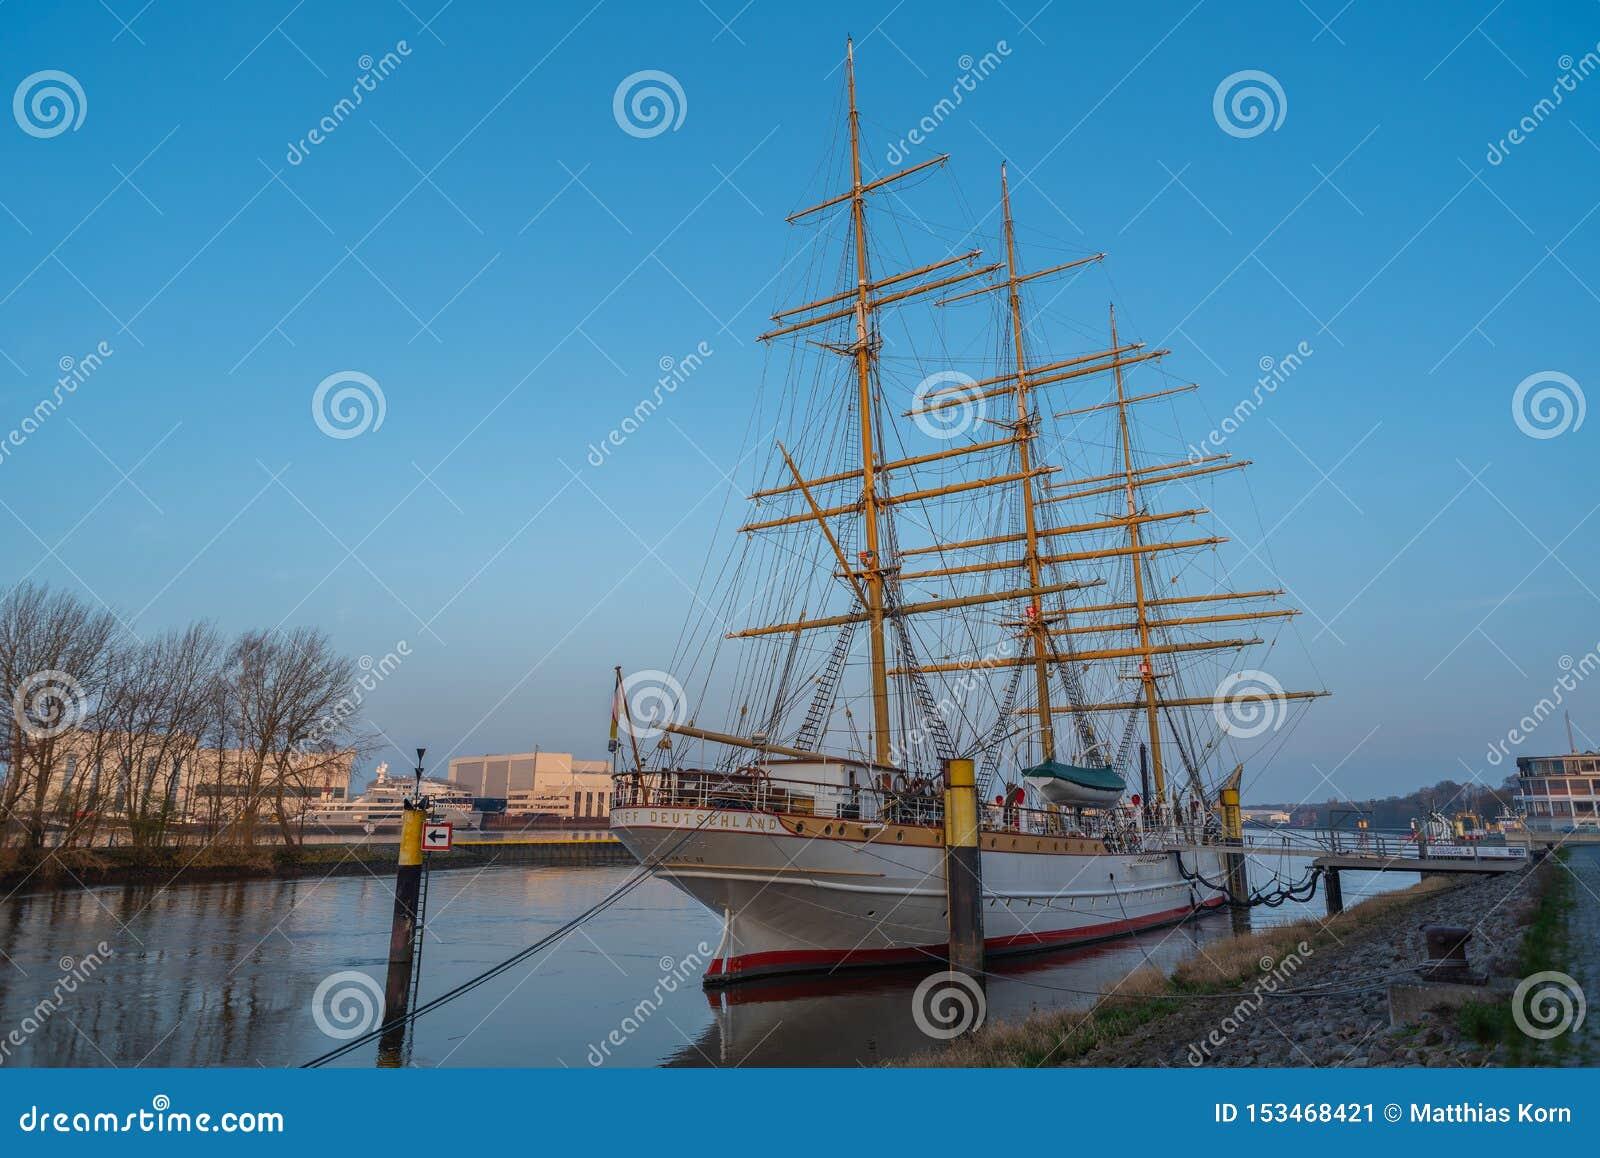 Bremen-Vegesack, Bremen, Germany - July 17, 2019 Bremen-Vegesack, Bremen, Germany - March 29, 2019 Sail school ship Germany is anc